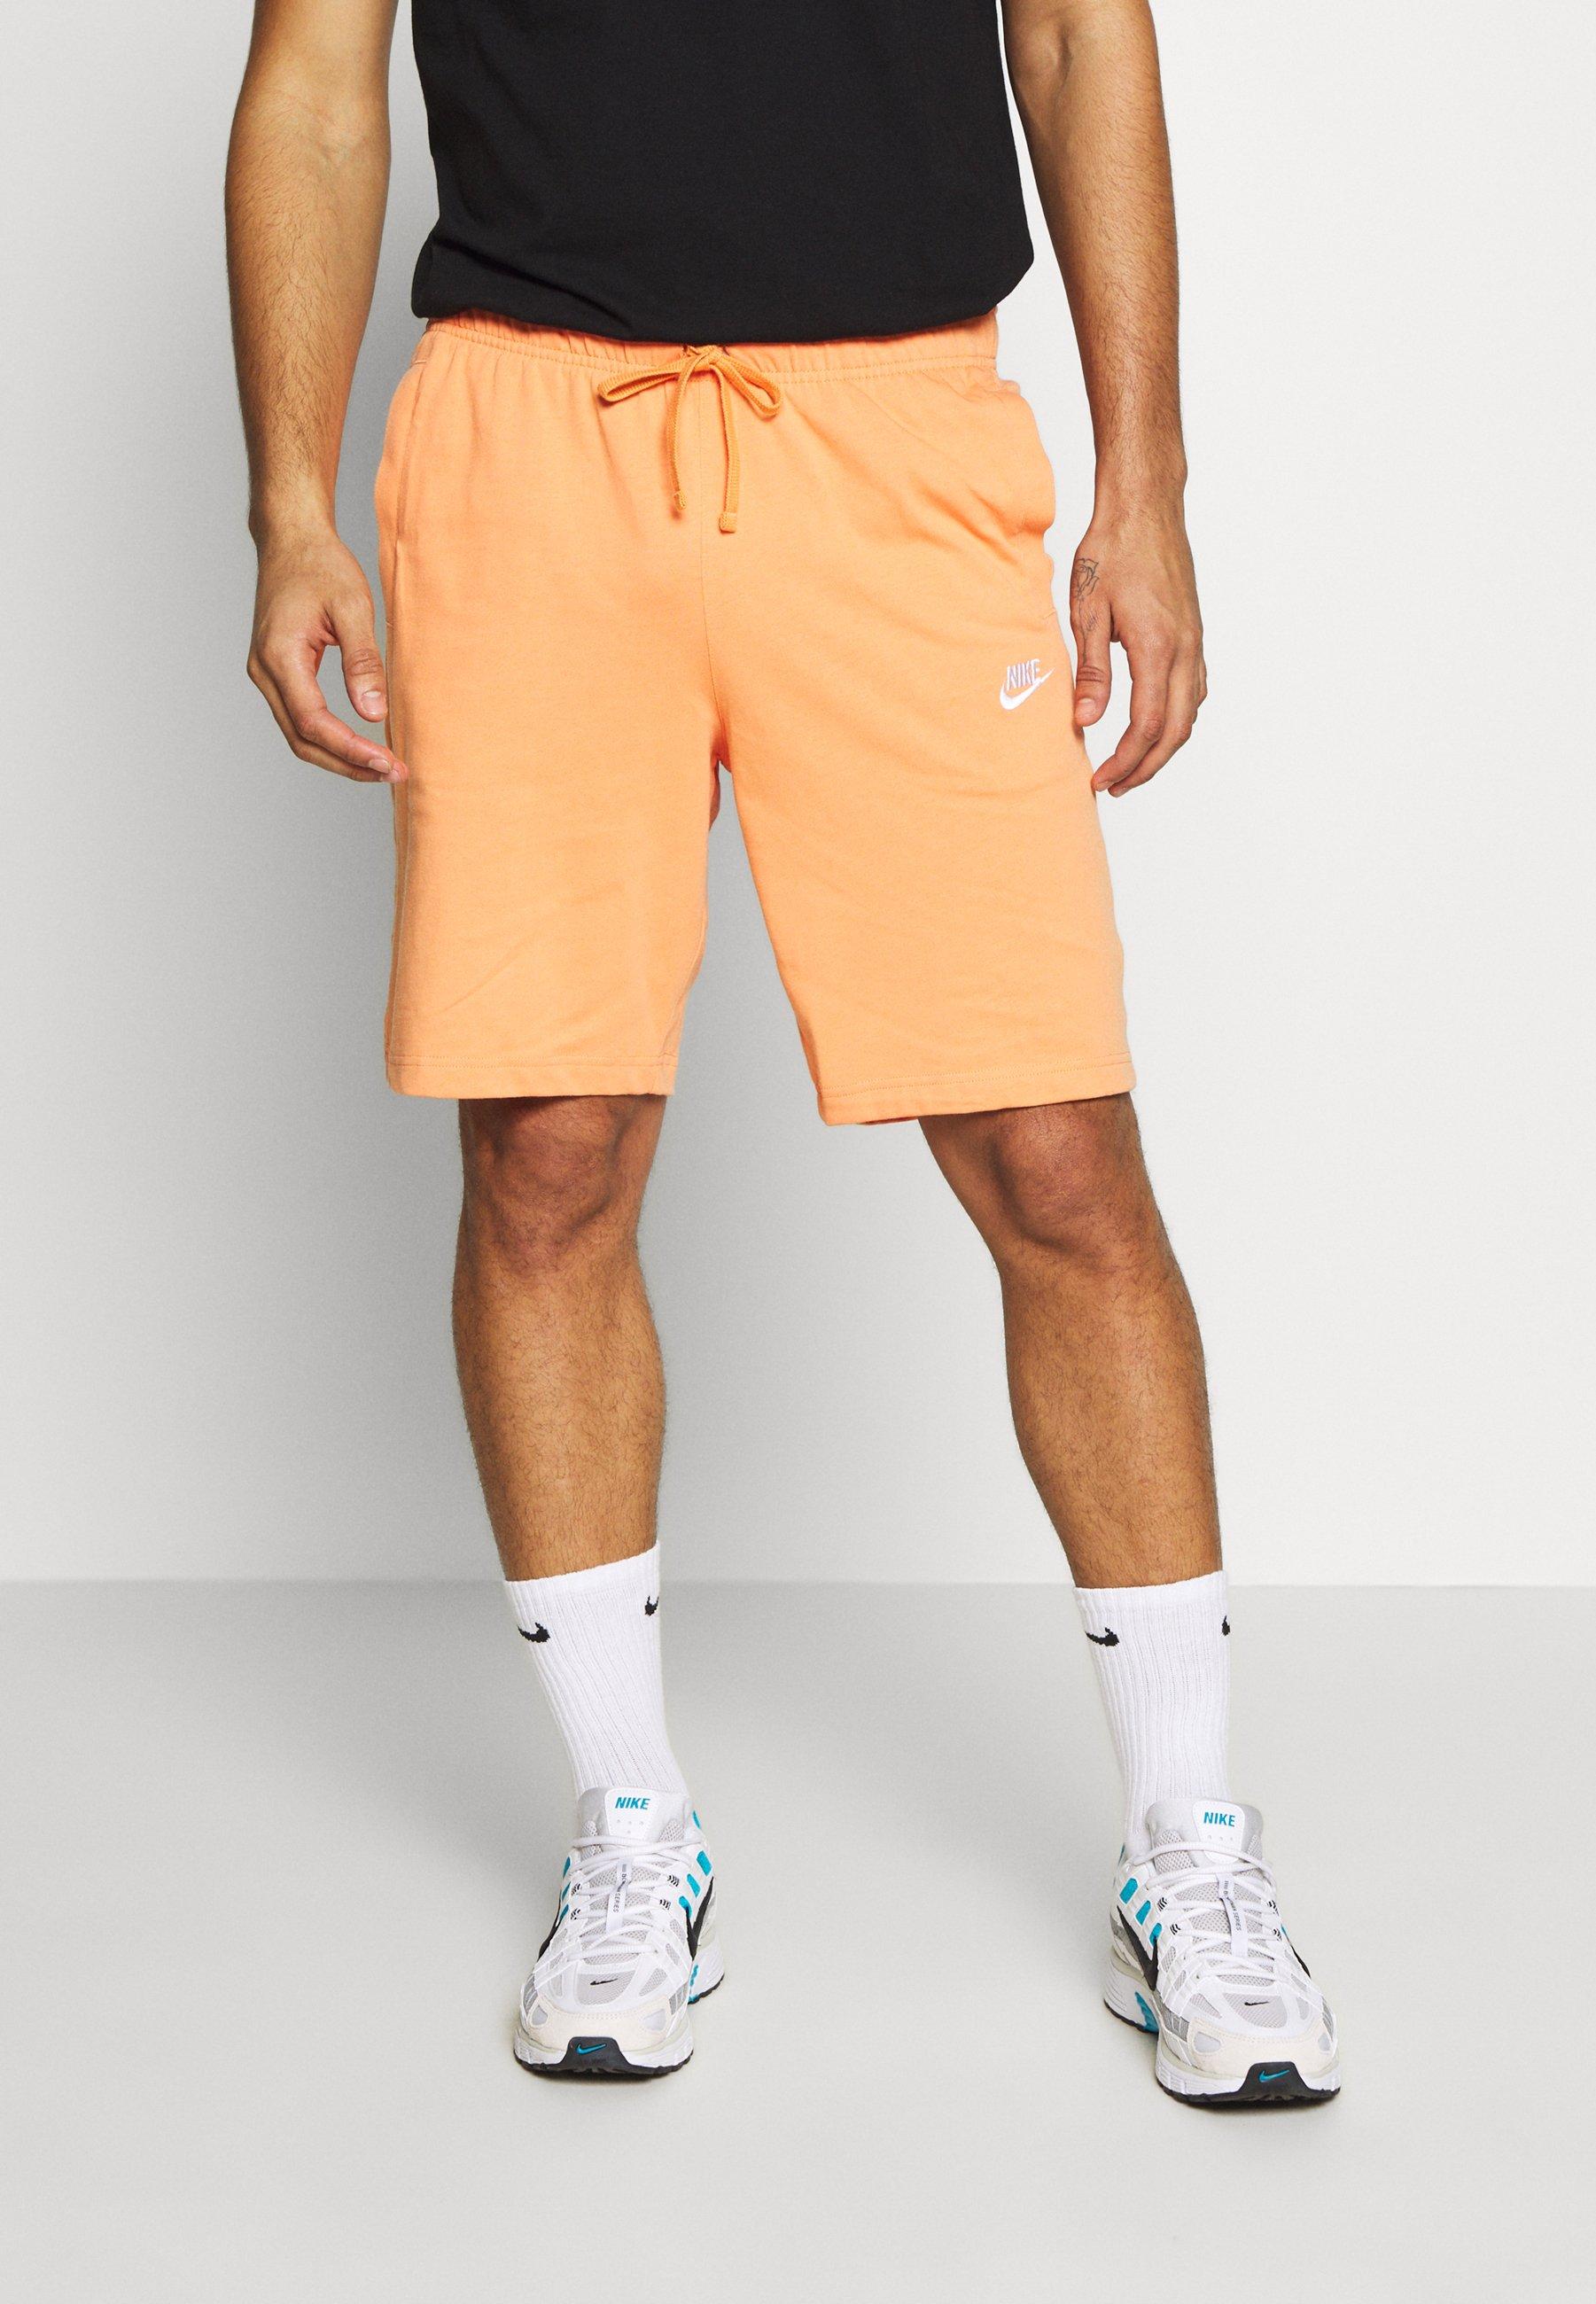 CLUB Short orange trancewhite